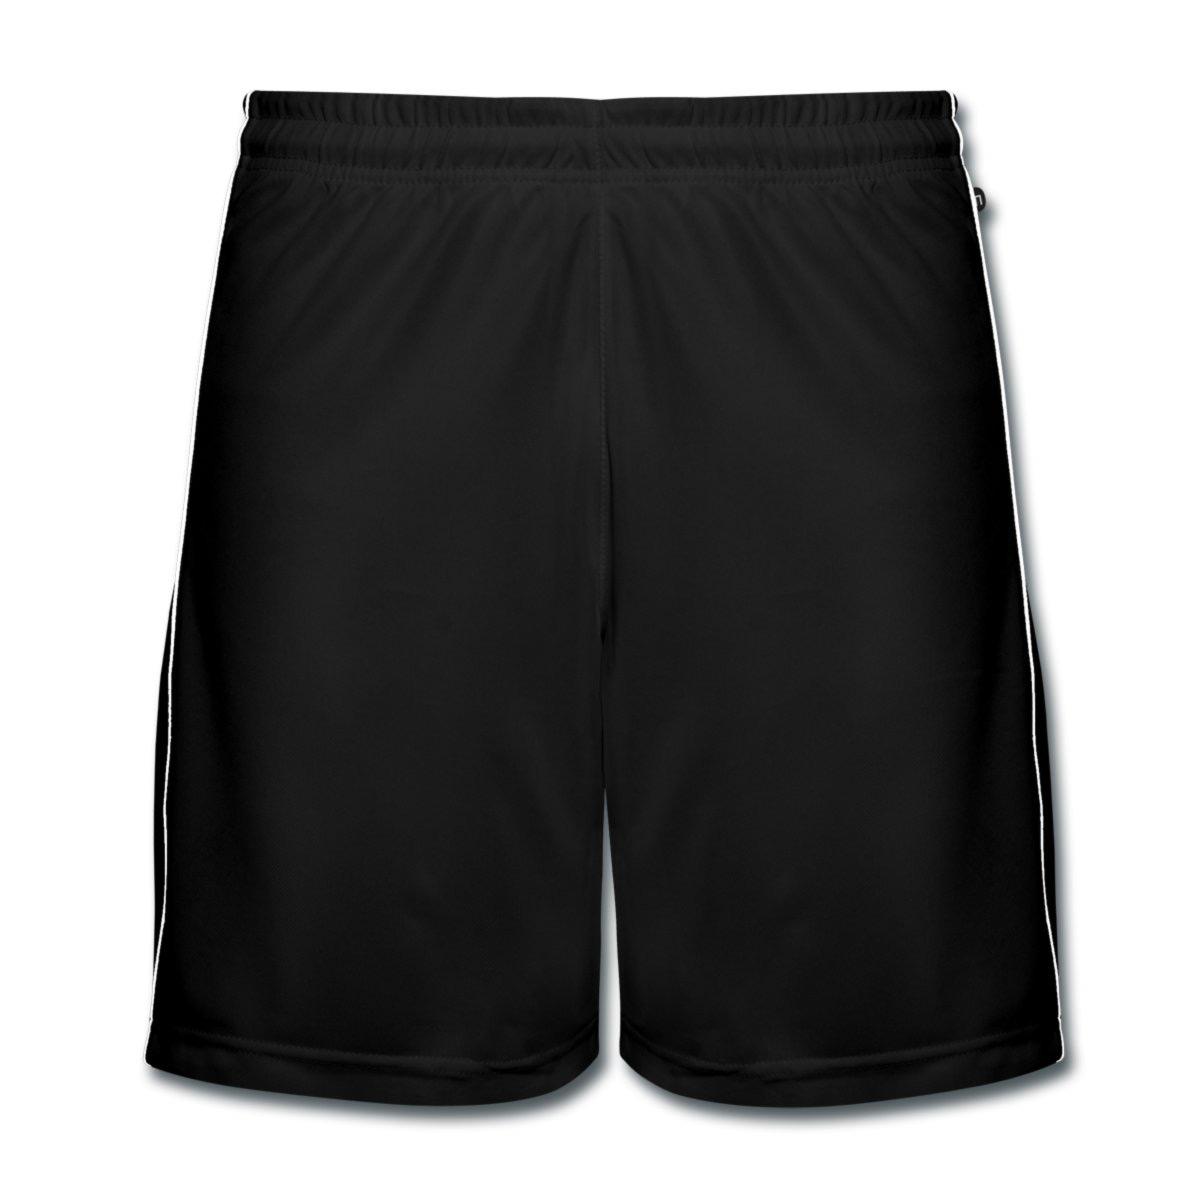 sporthose bedrucken kurze m nner sporthosen gestalten. Black Bedroom Furniture Sets. Home Design Ideas